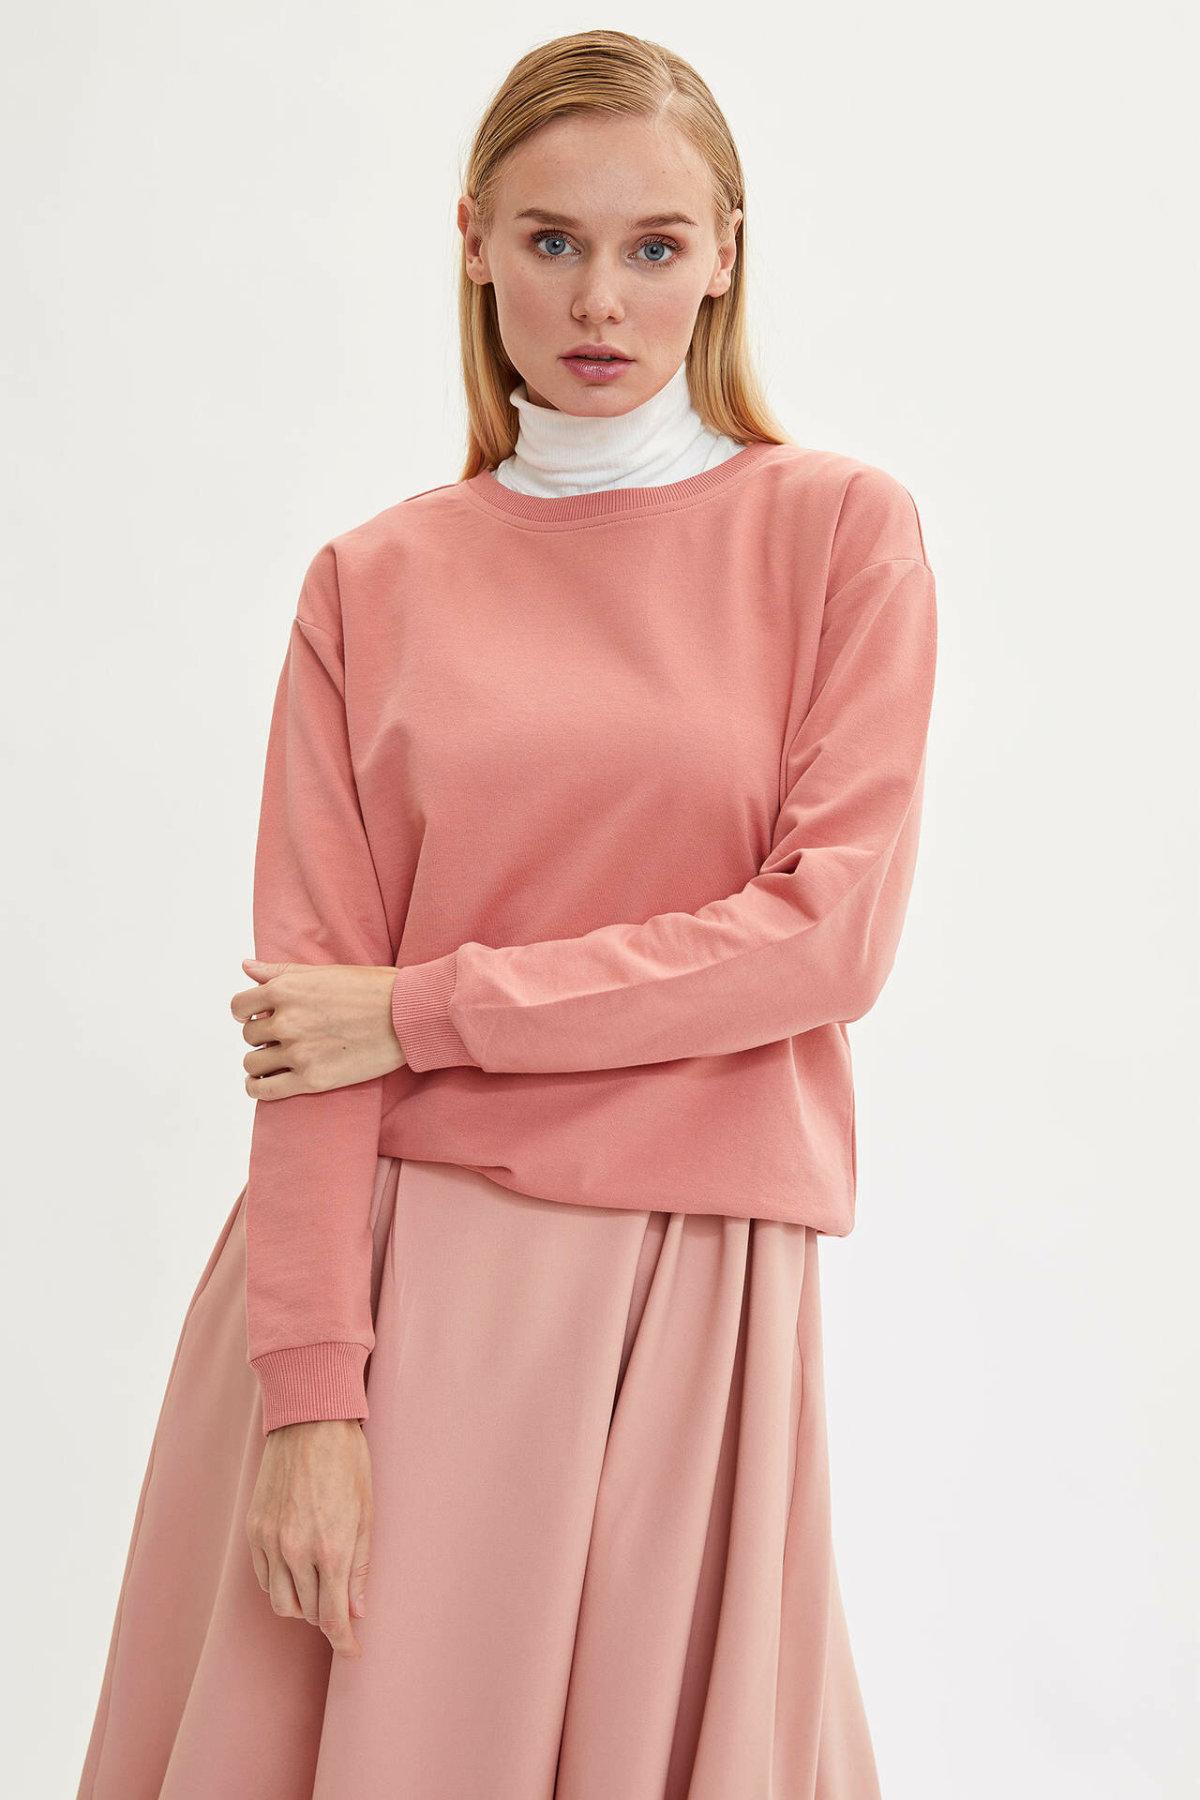 DeFacto Women Pure White O-neck Leisure Long Sleeve Women Pullover Casual Cotton Fashion Ladies Sweatshirts-M0021AZ19AU-M0021AZ19AU